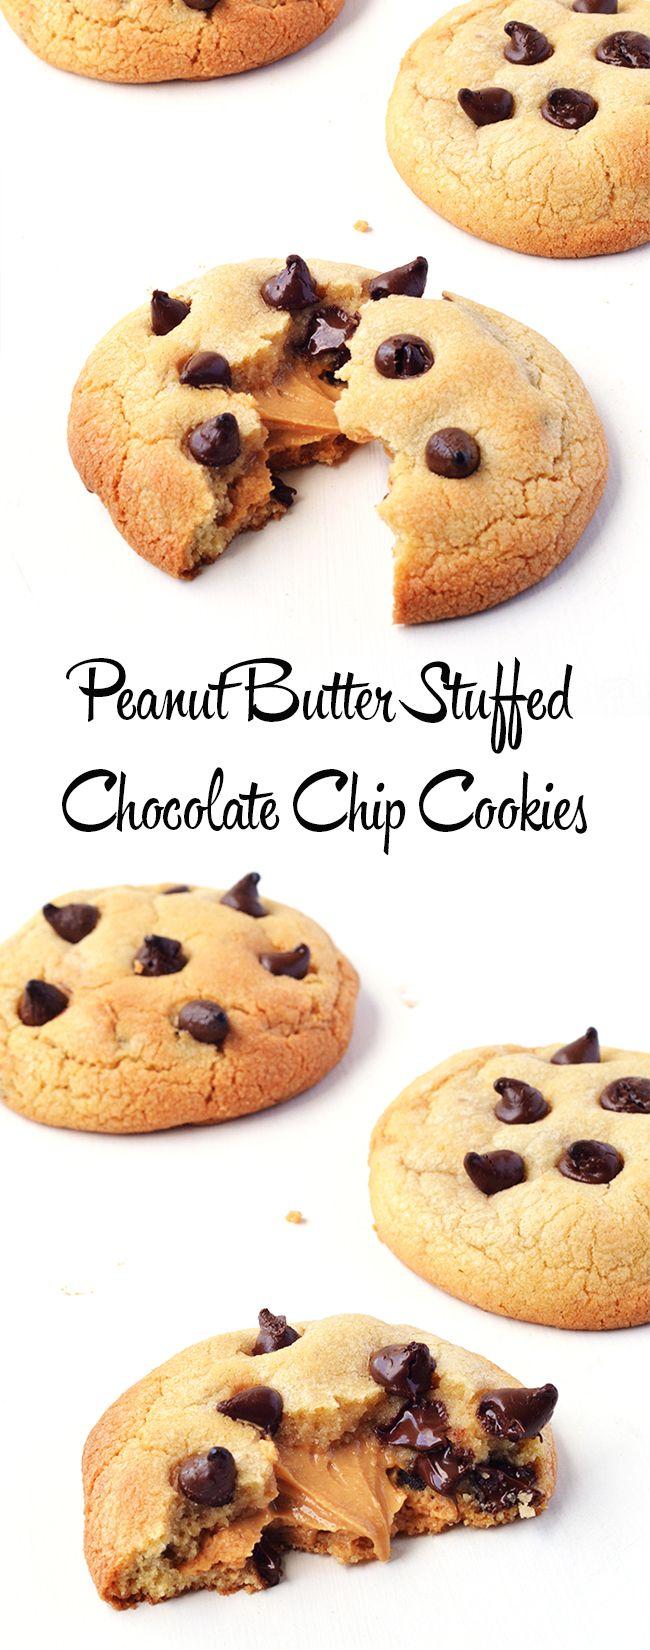 Peanut Butter Stuffed Chocolate Chip Cookies | via sweetestmenu.com